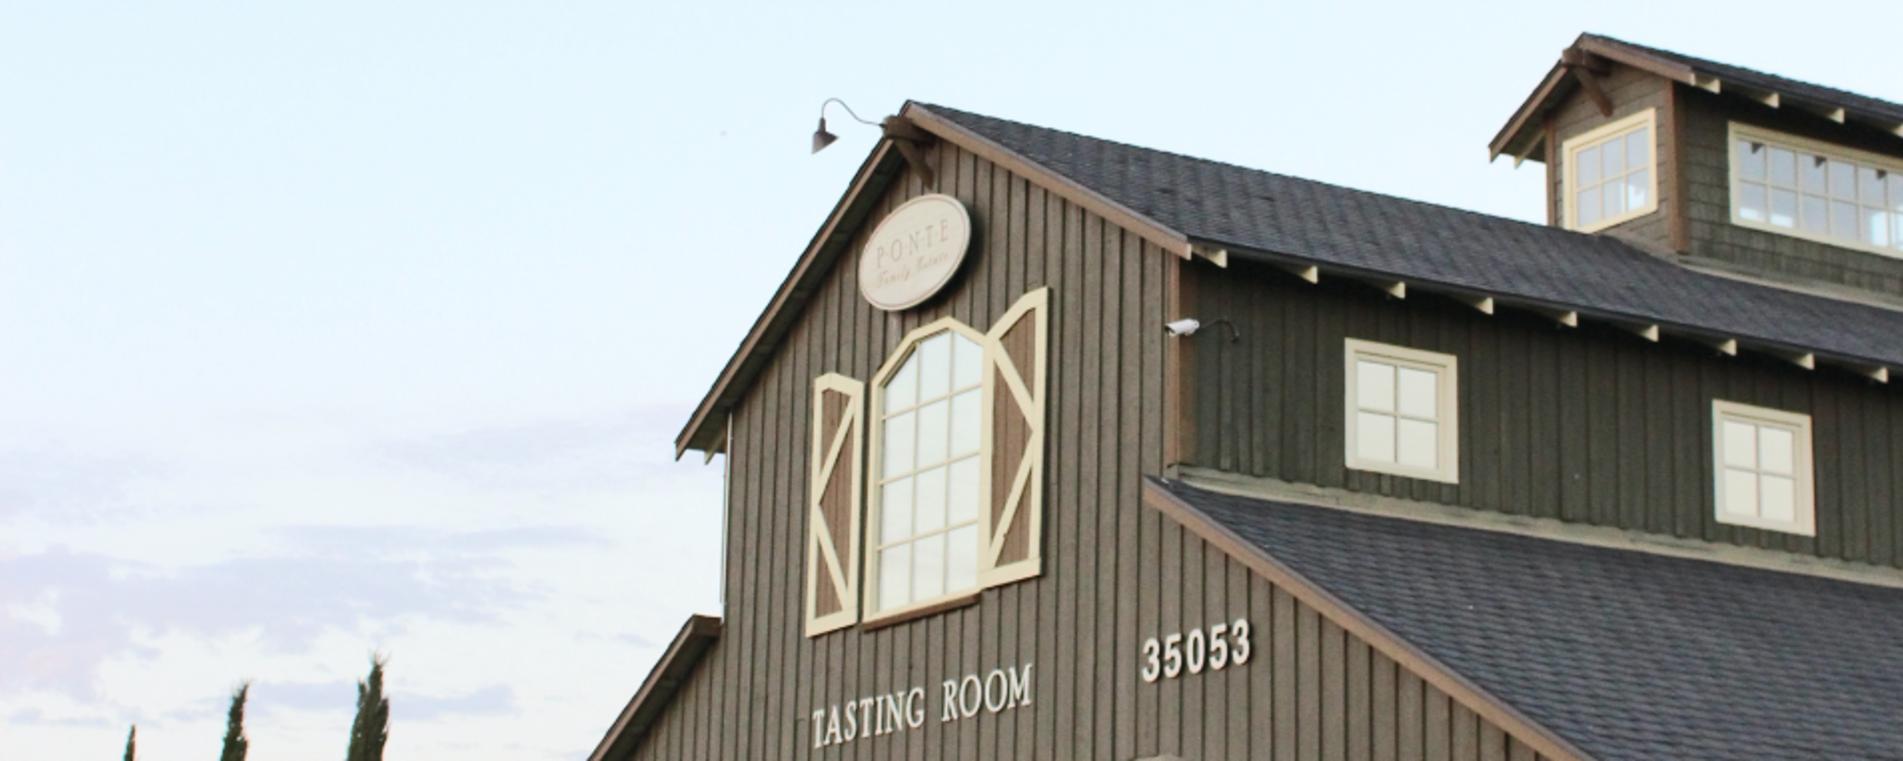 Tasting Room - Ponte Family Estate Winery